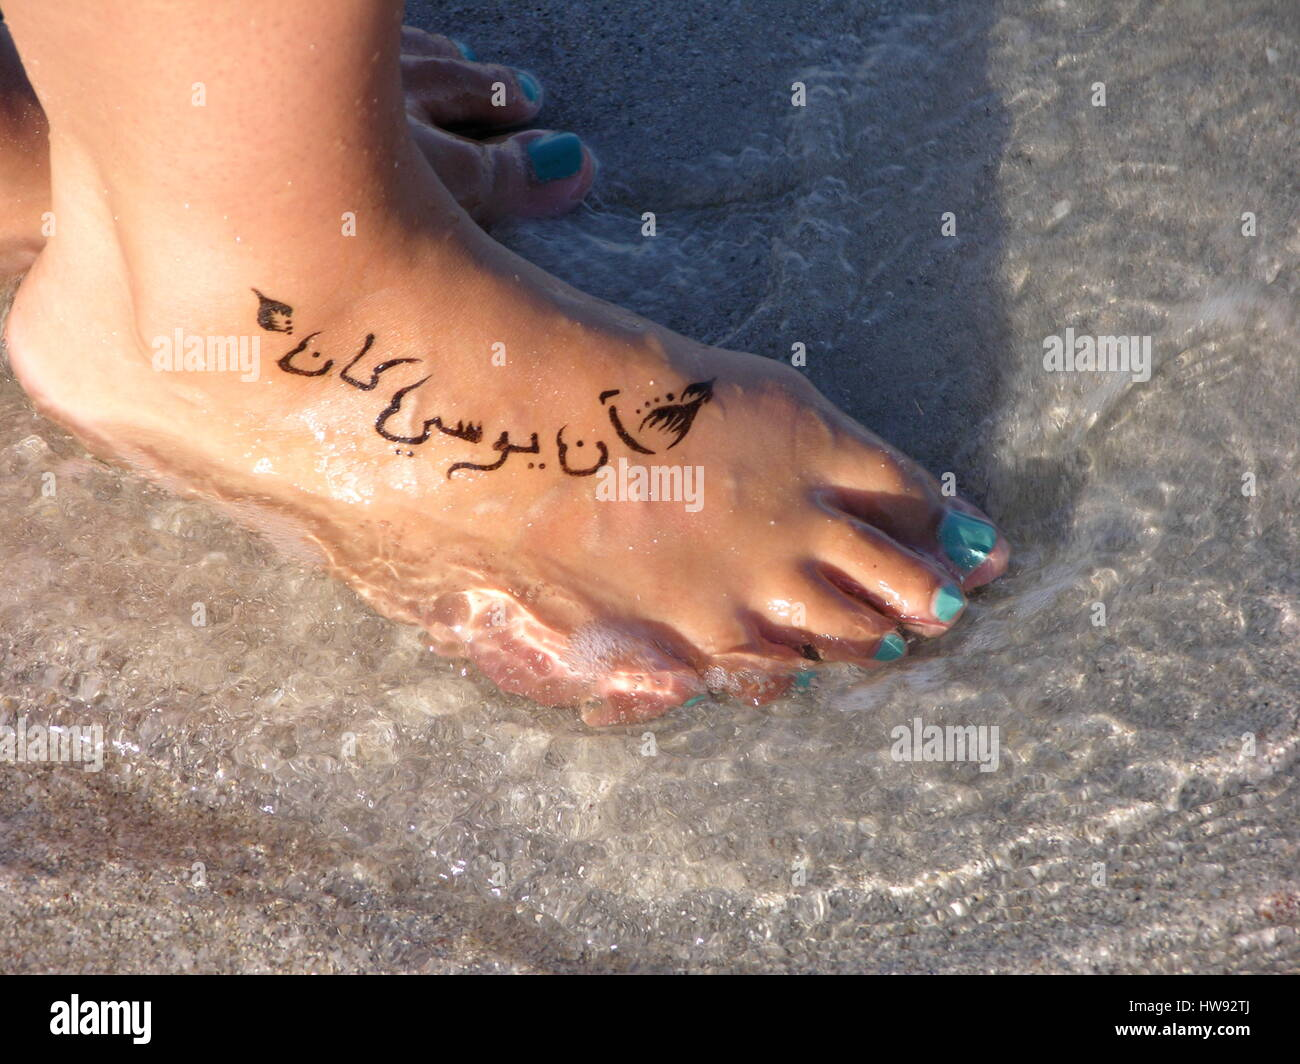 fu tattoo mit arabischem text am strand stockfoto bild. Black Bedroom Furniture Sets. Home Design Ideas